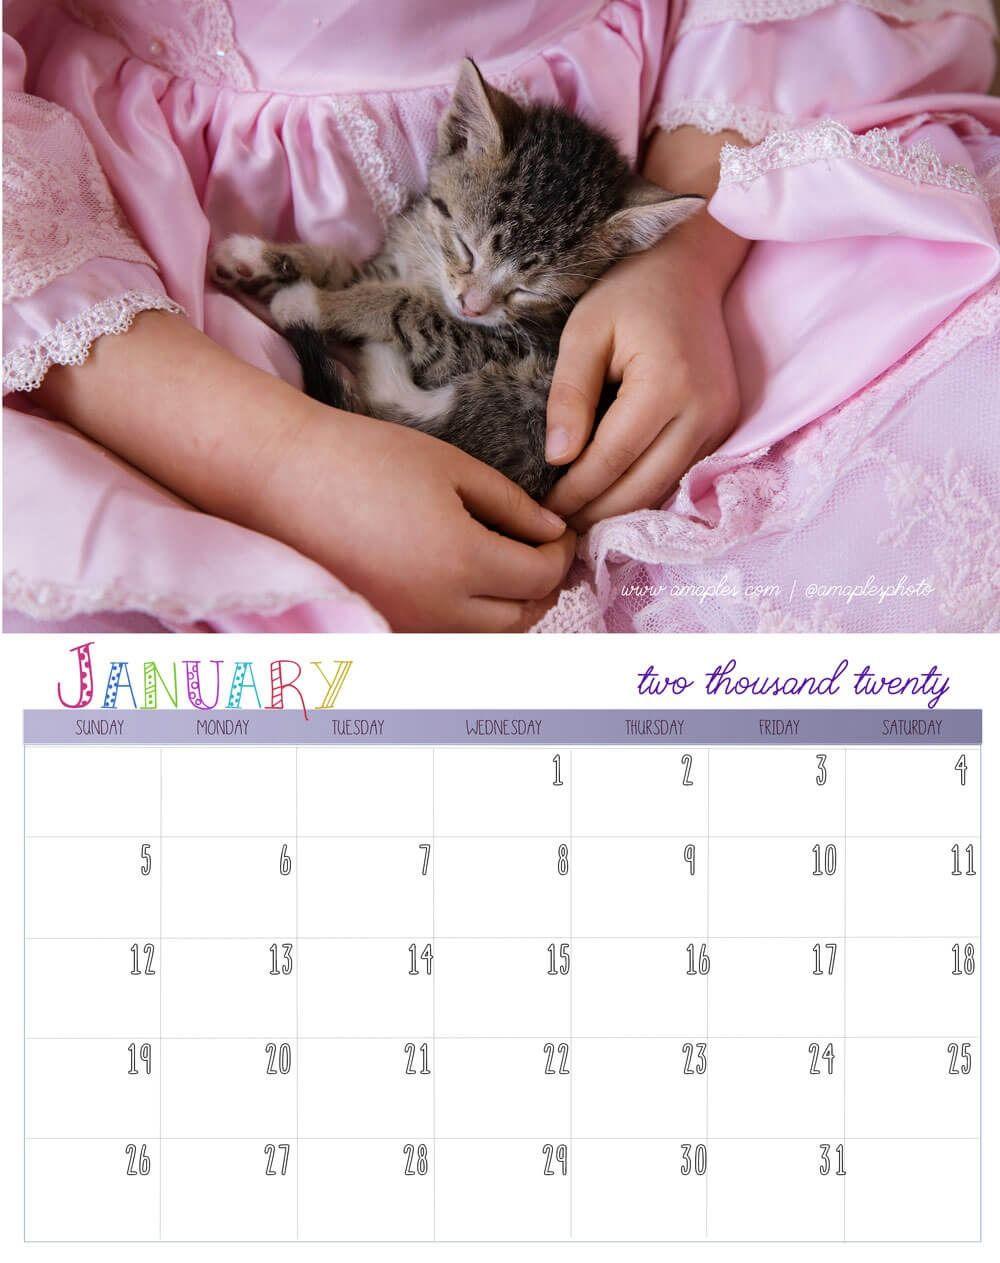 Order Your 2020 Kitten Calendar Kittens Cutest Kittens Homeless Pets